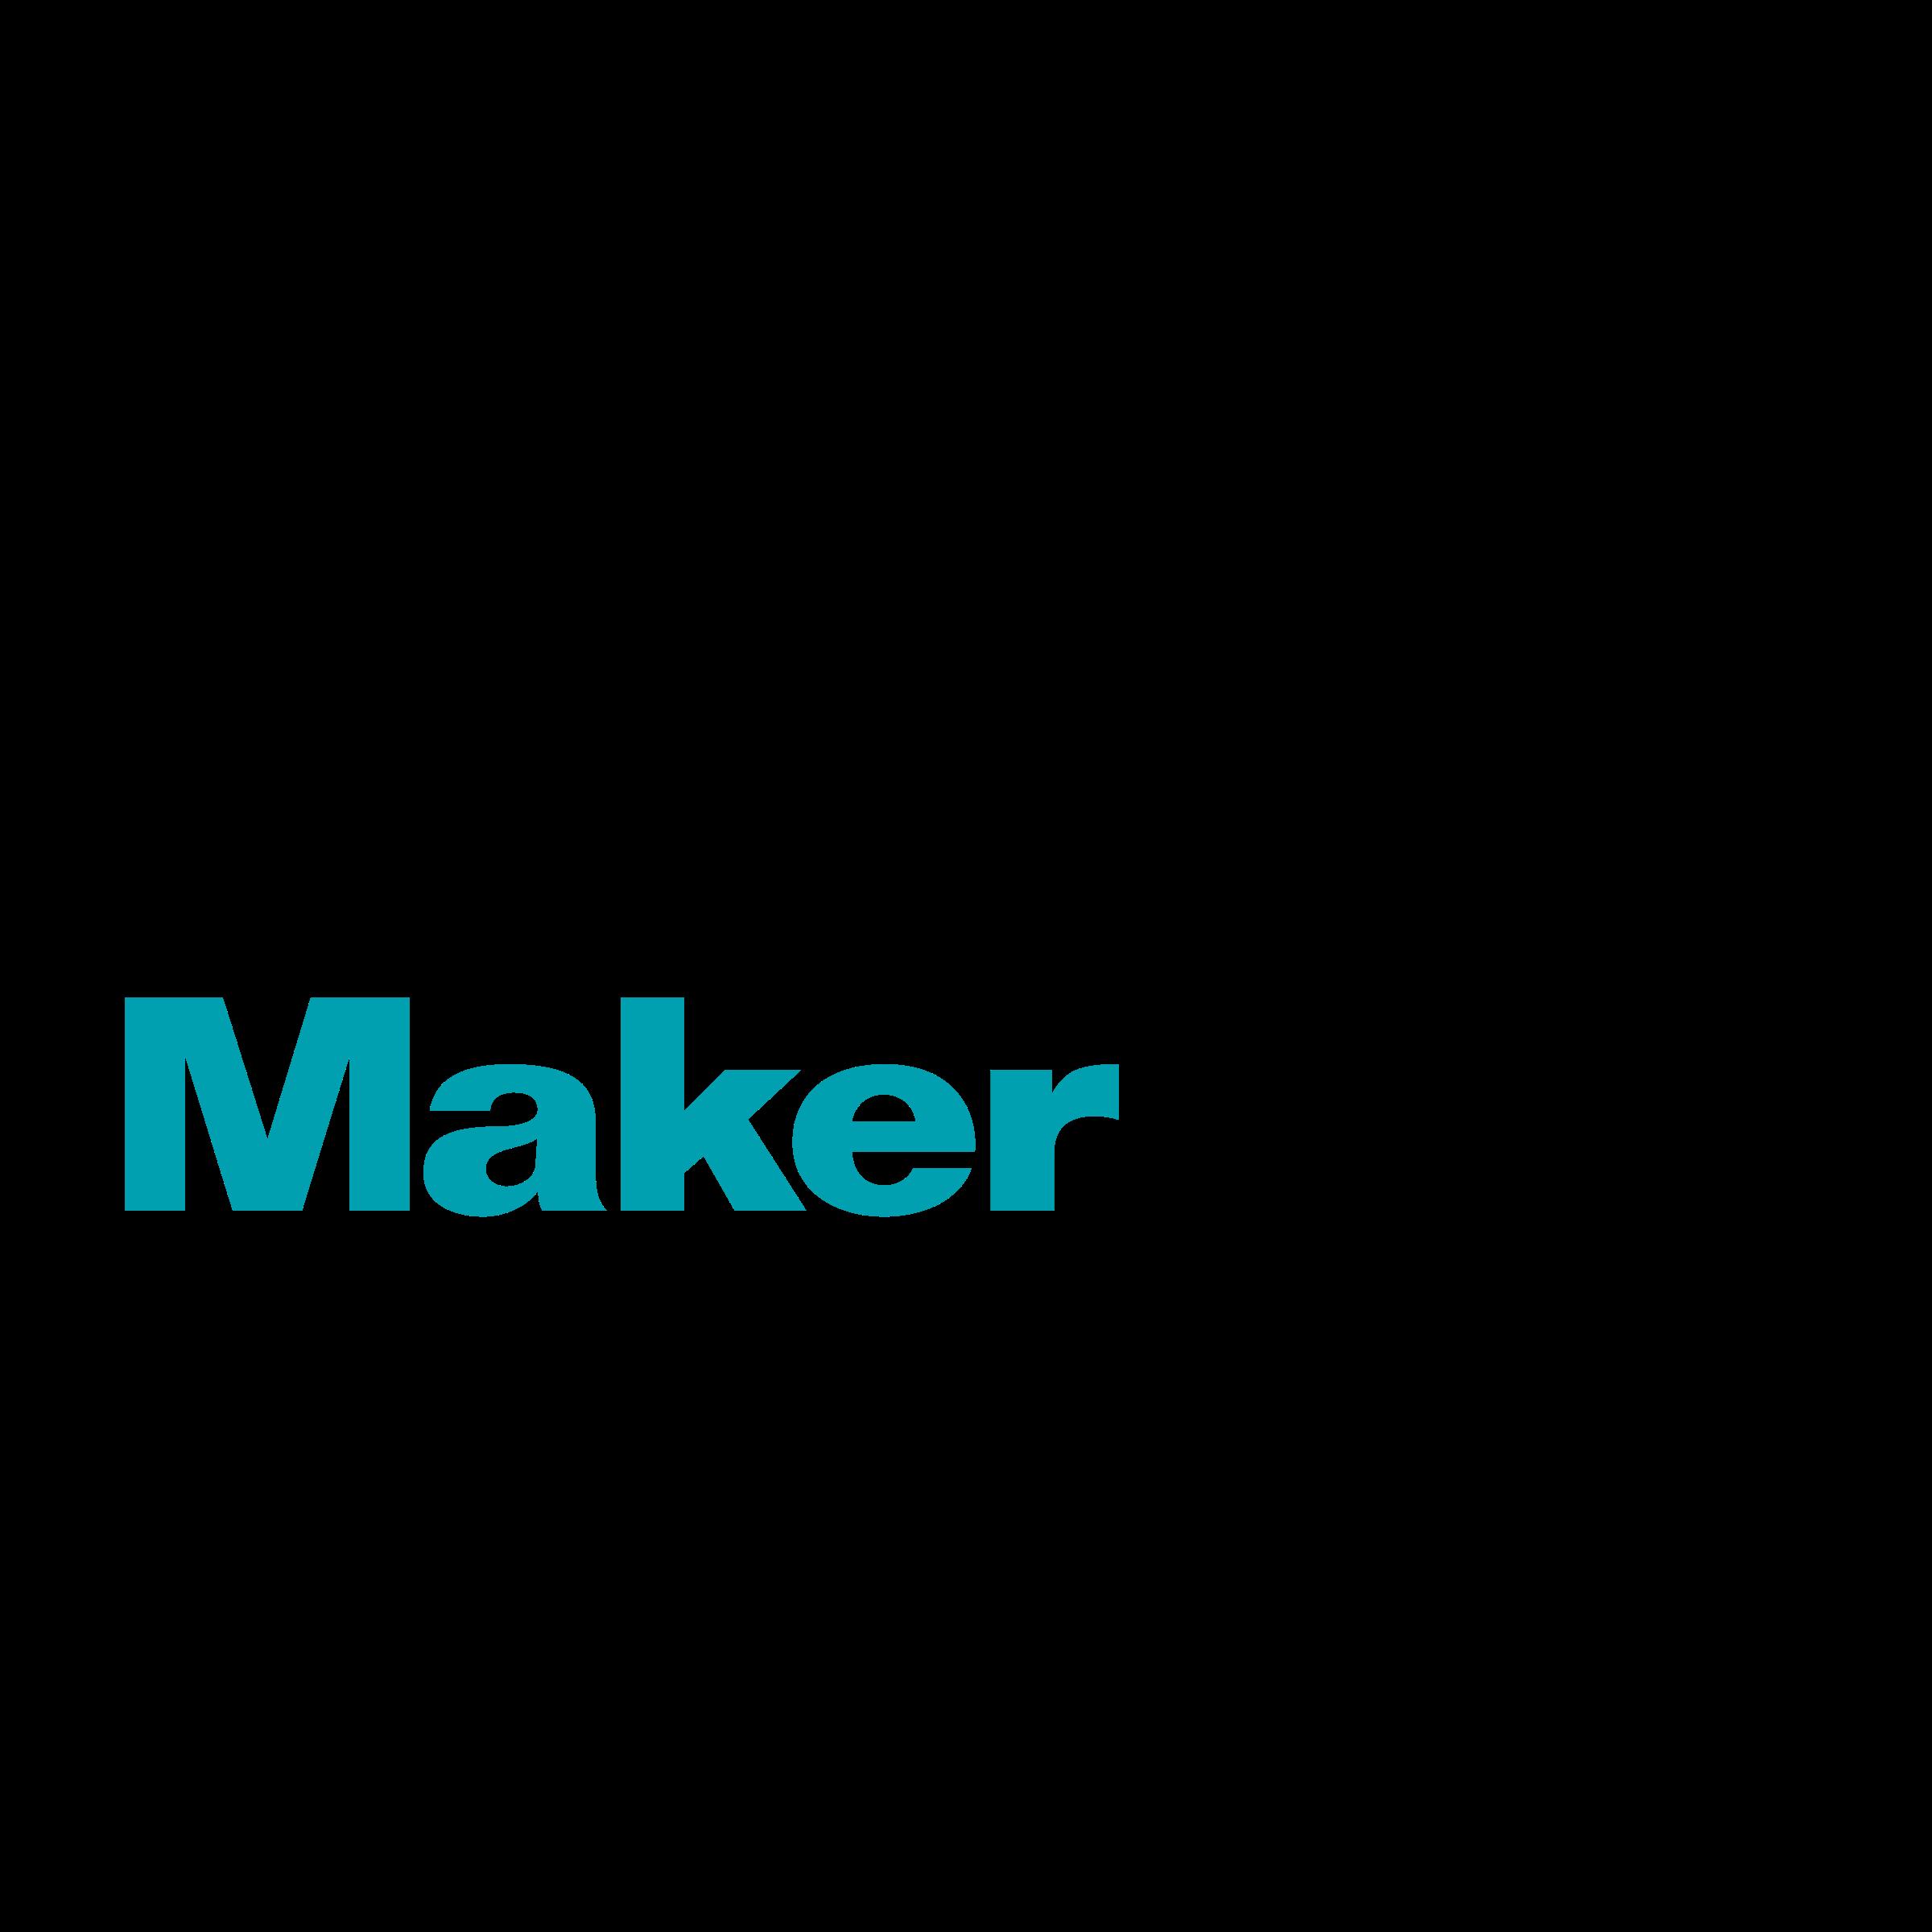 Panorama Maker Logo PNG Transparent & SVG Vector - Freebie Supply